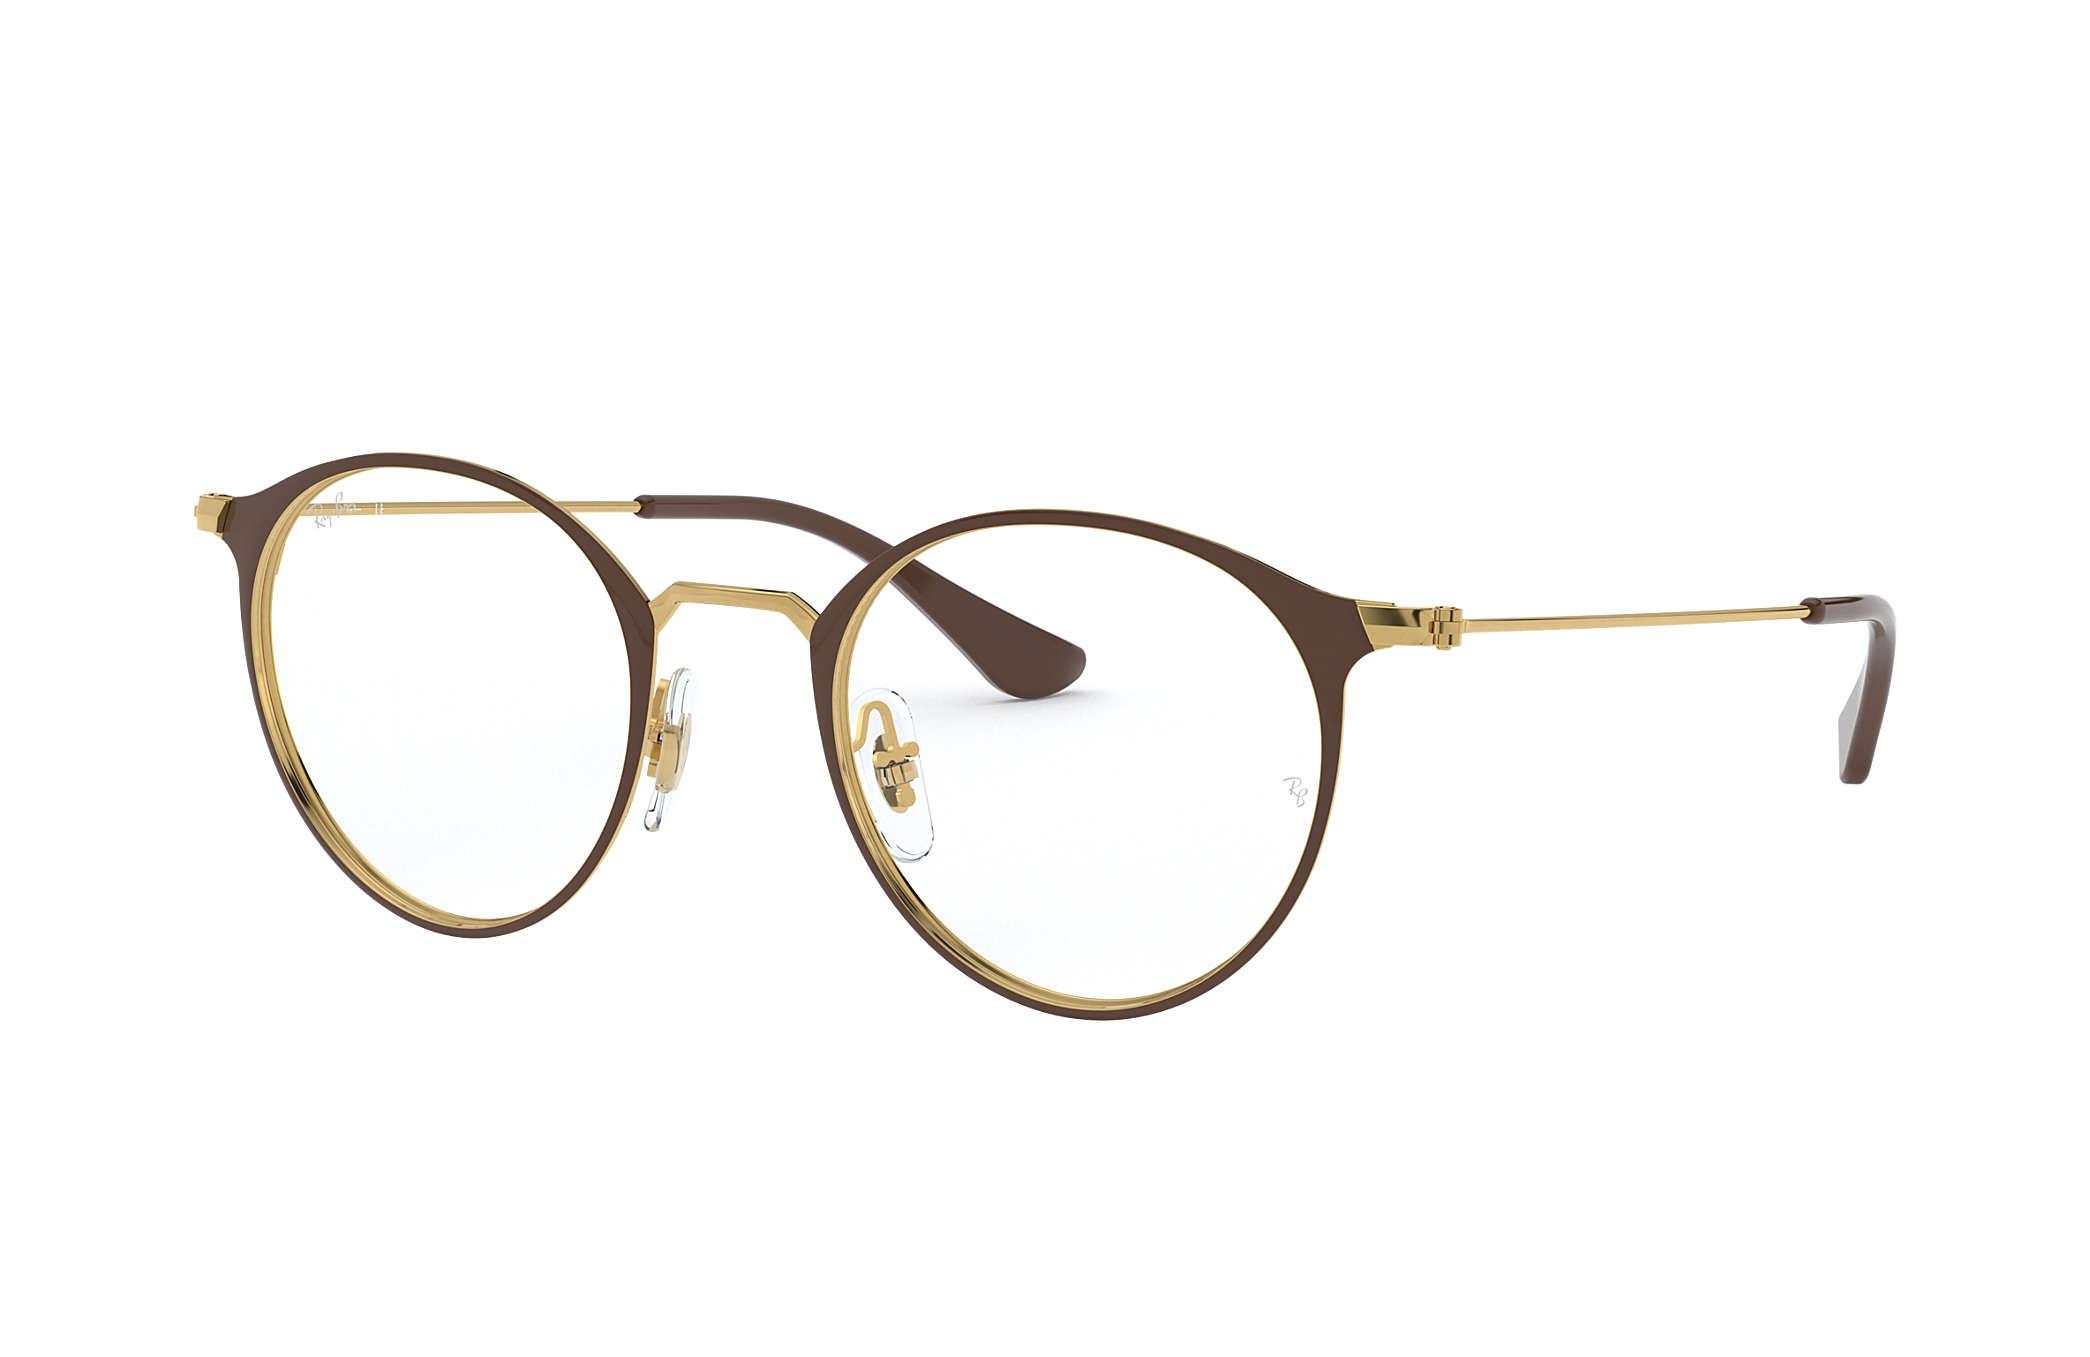 6c2306531658c Óculos de grau Ray-Ban RB6378 Marrom - Metal - 0RX6378290549